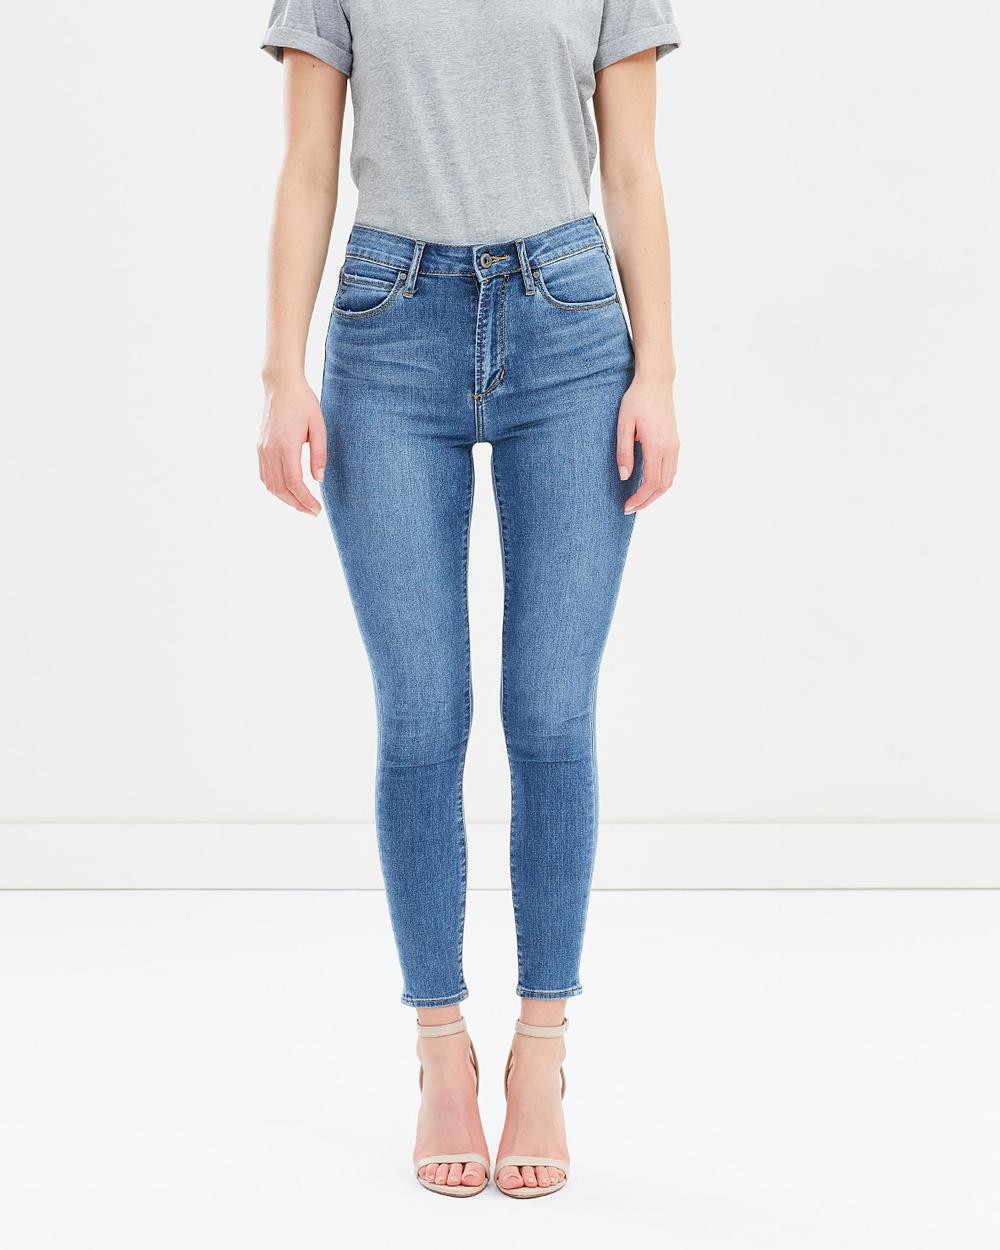 Articles of Society High Lisa Ankle Hug Jeans High-Waisted Aloha Blue